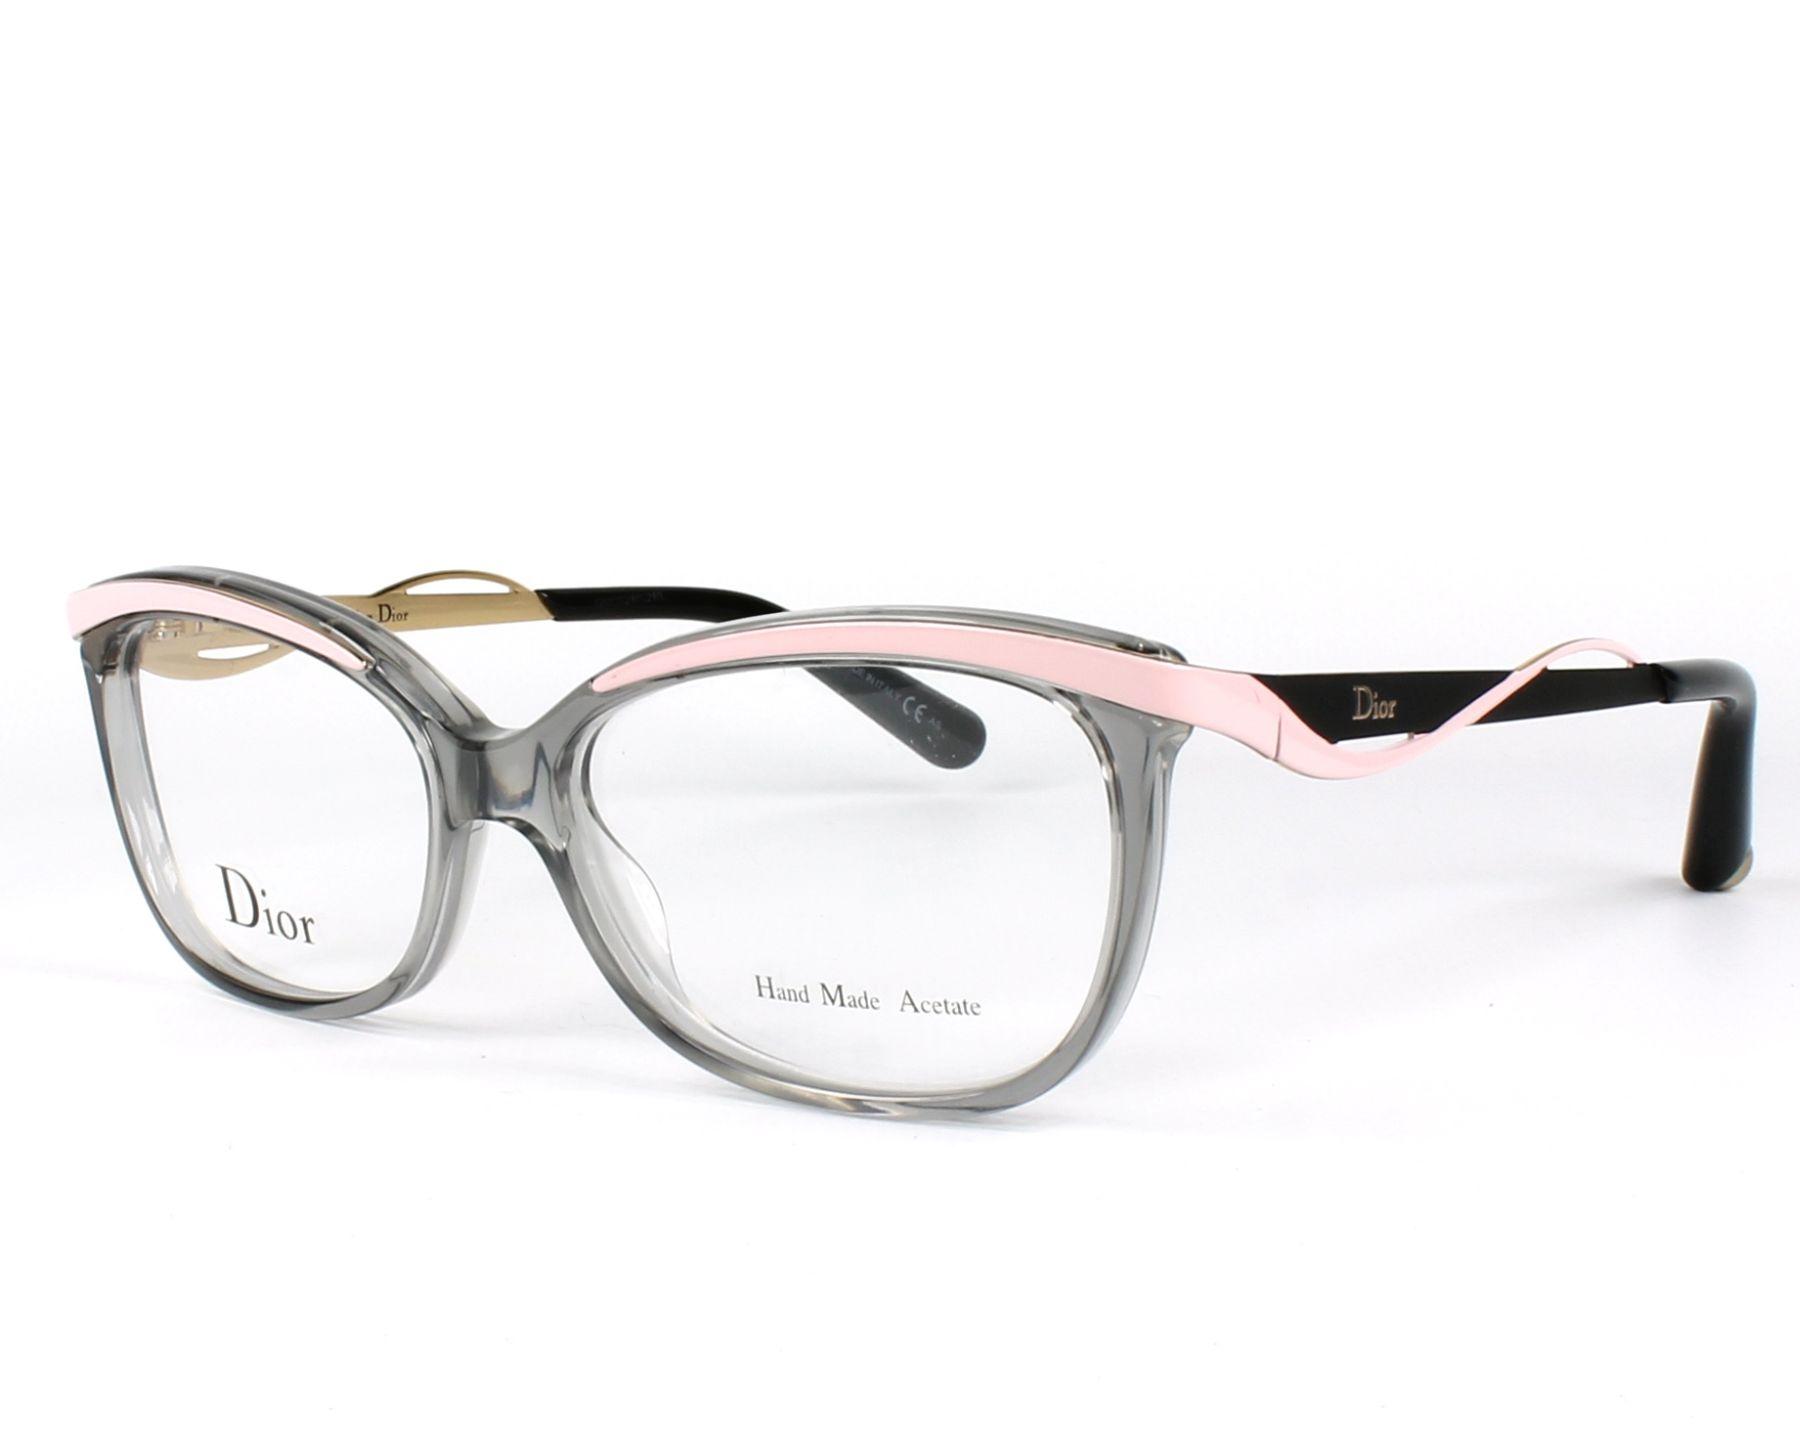 Christian Dior Eyeglasses Cd 3280 8lc Grey Visionet